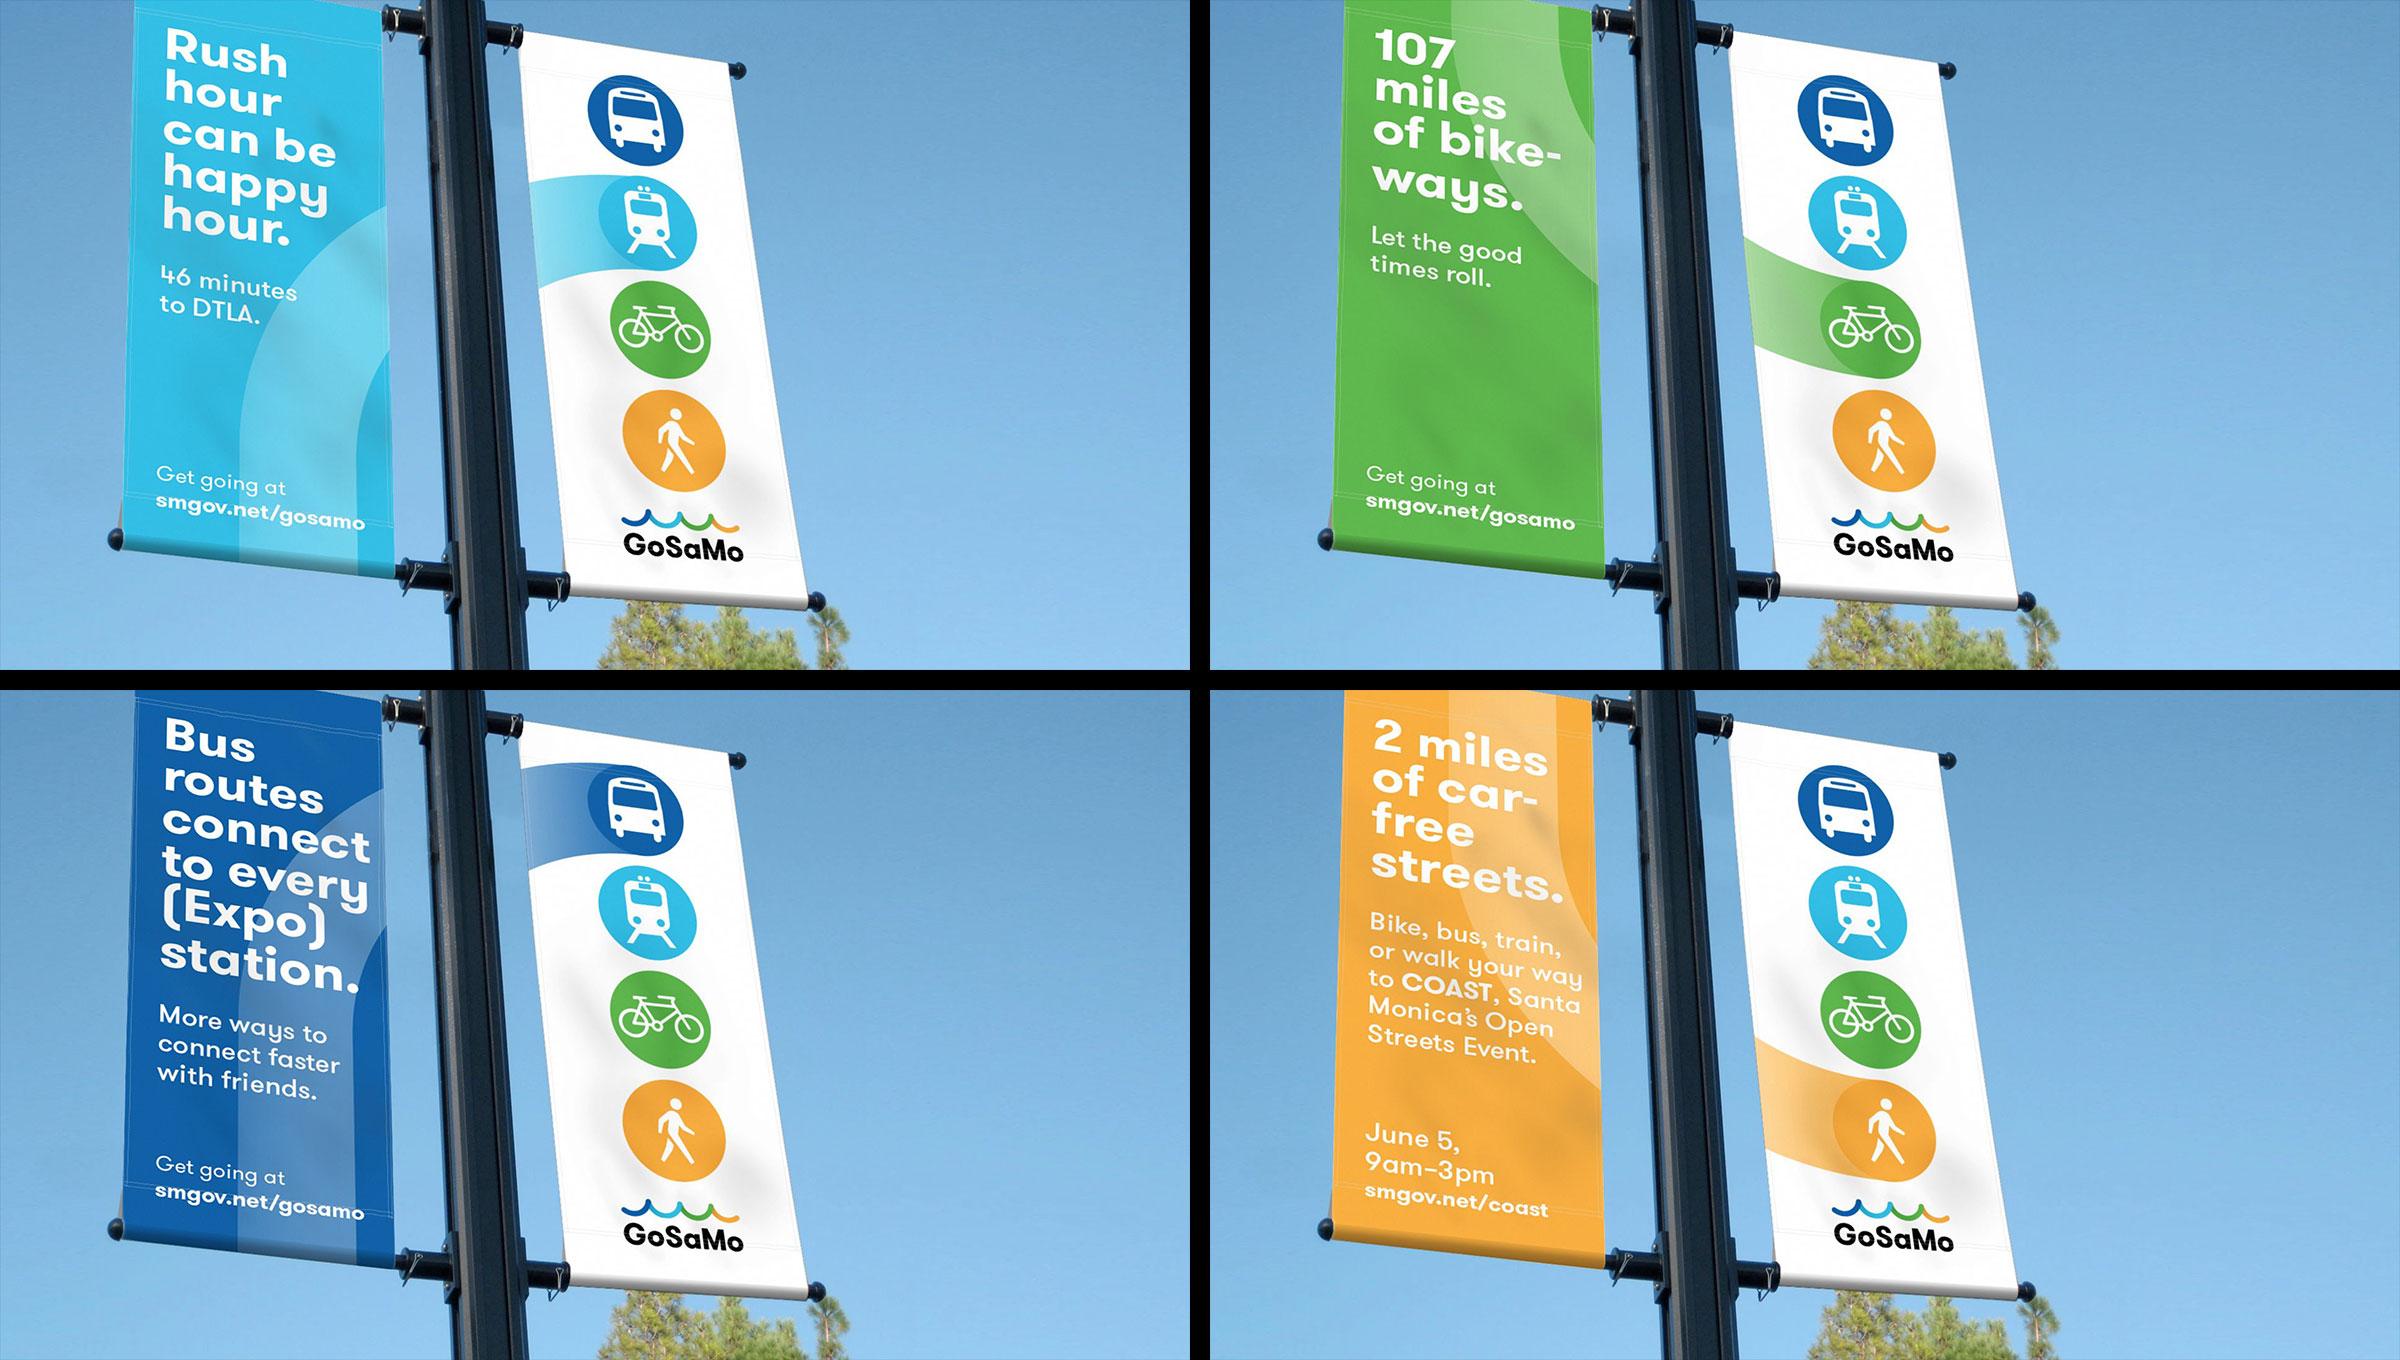 gosamo banner advertisements